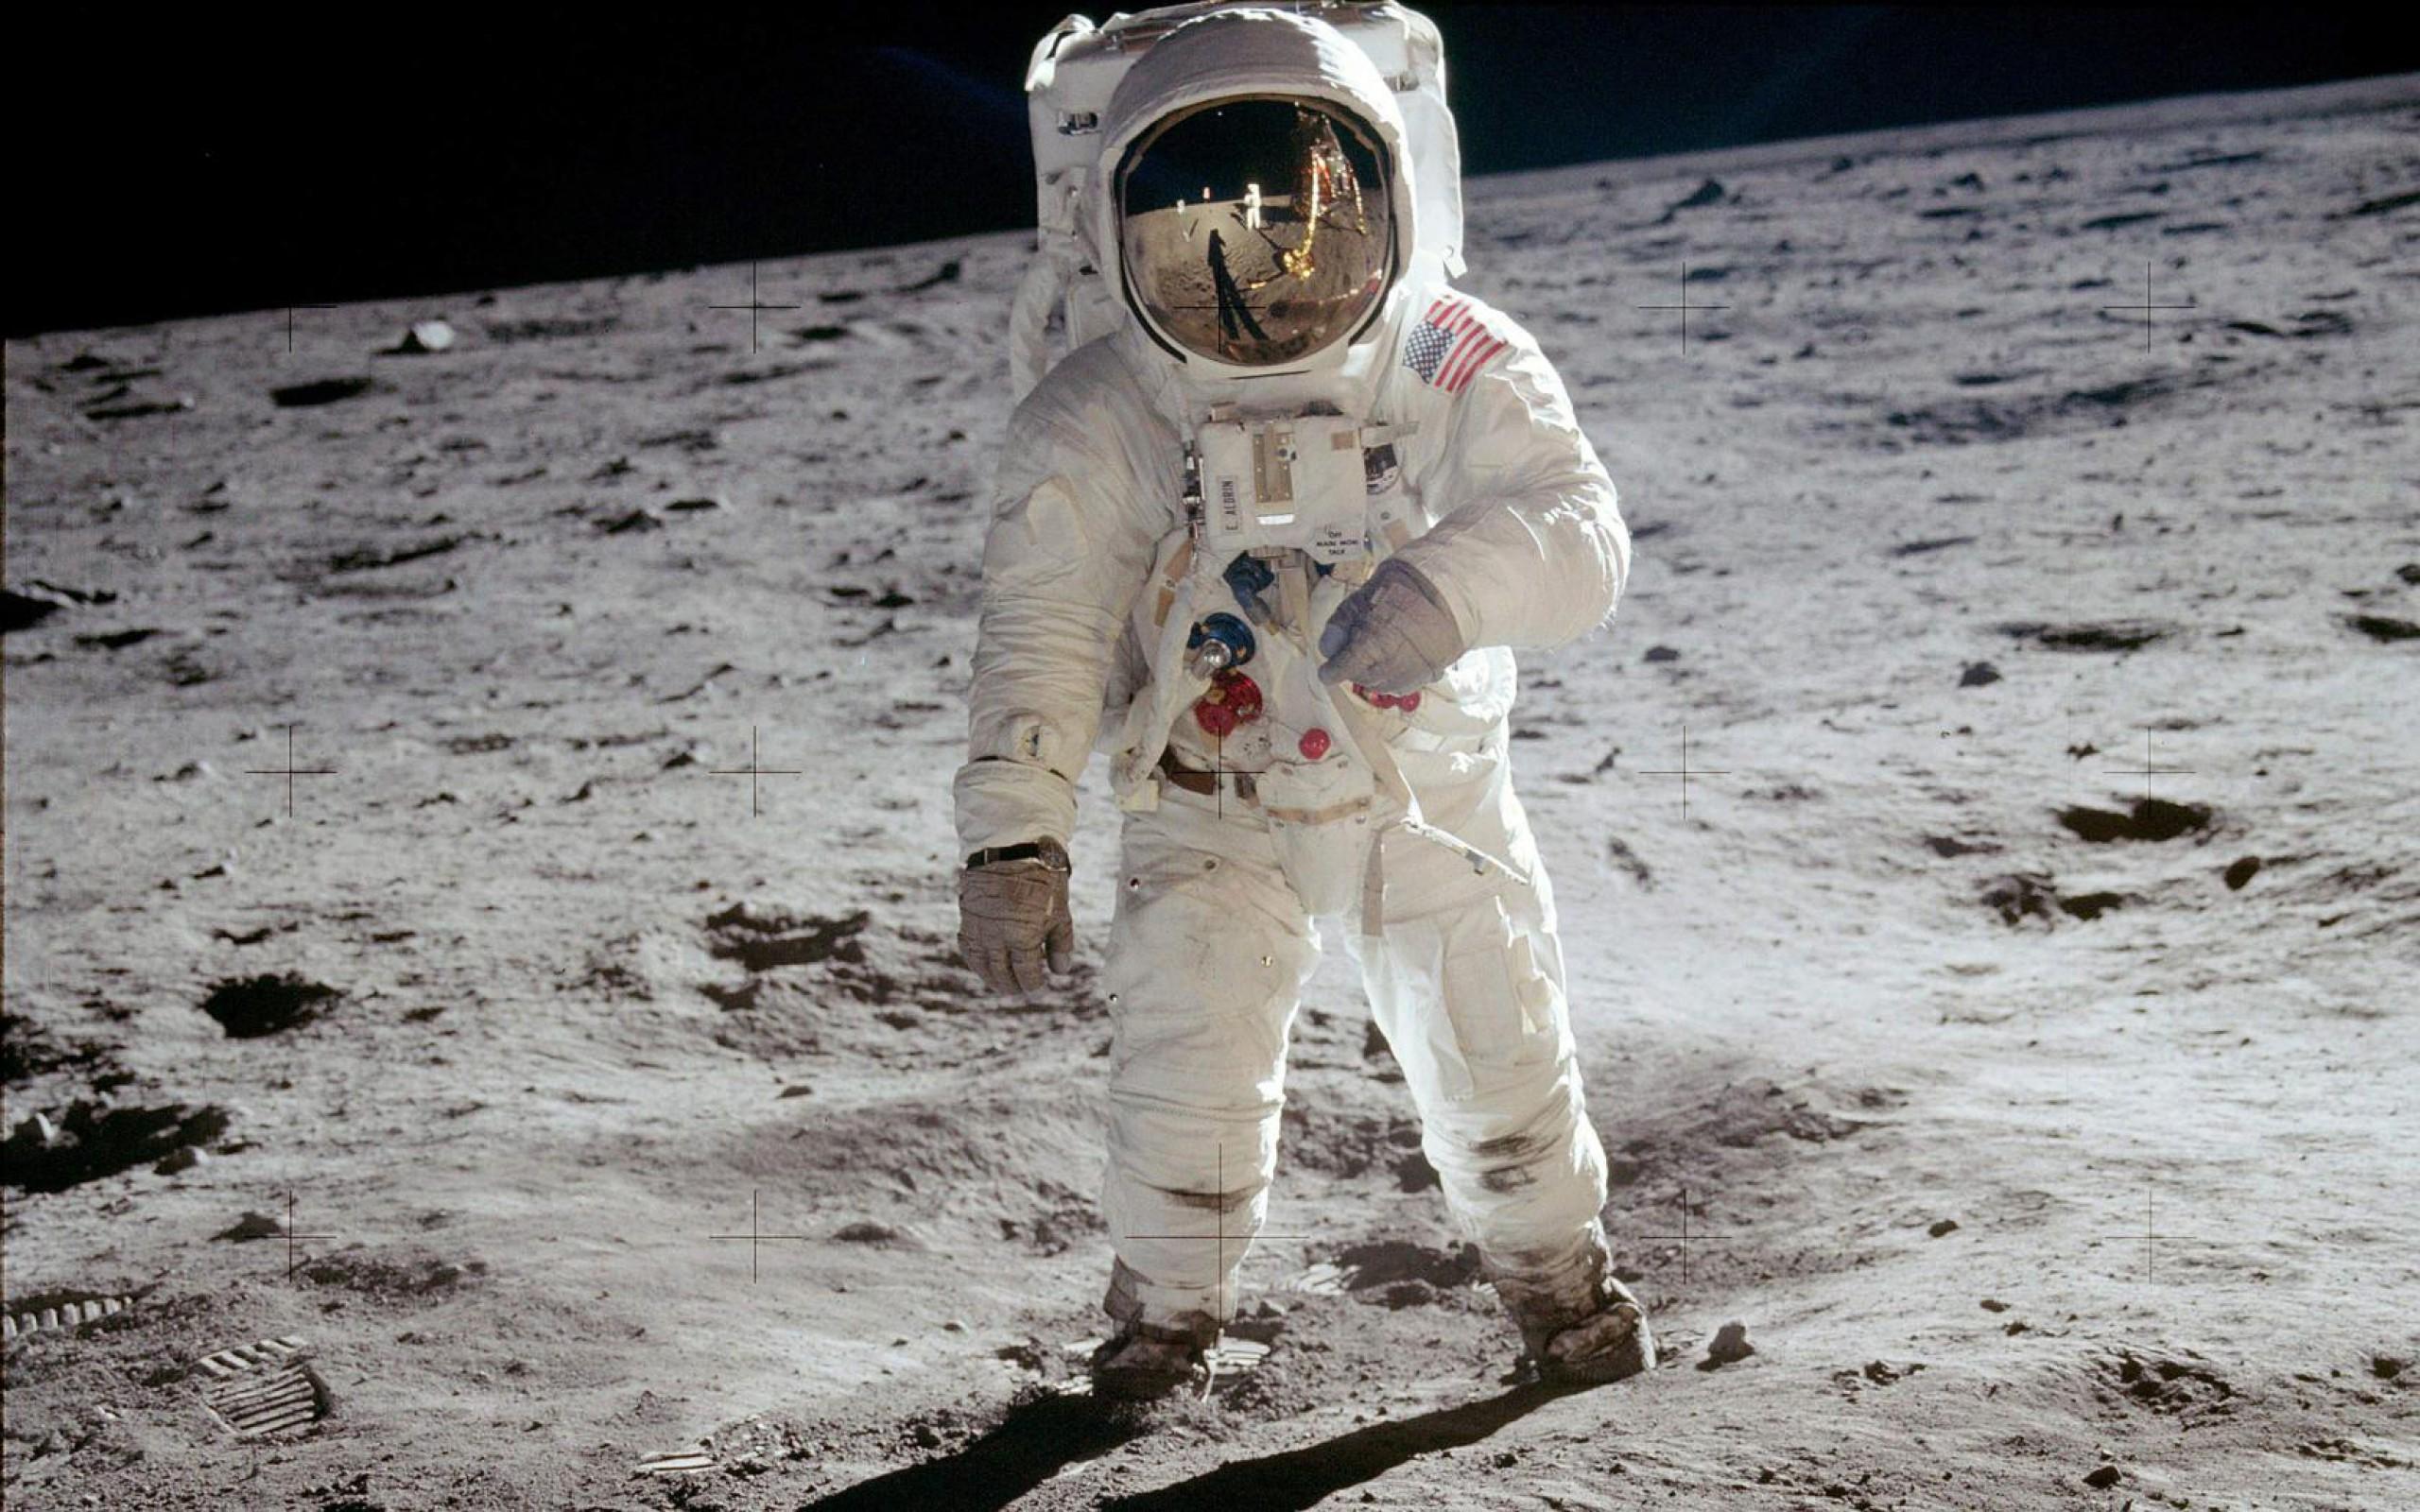 Astronaut moon wallpaper 2560x1600 34377 2560x1600